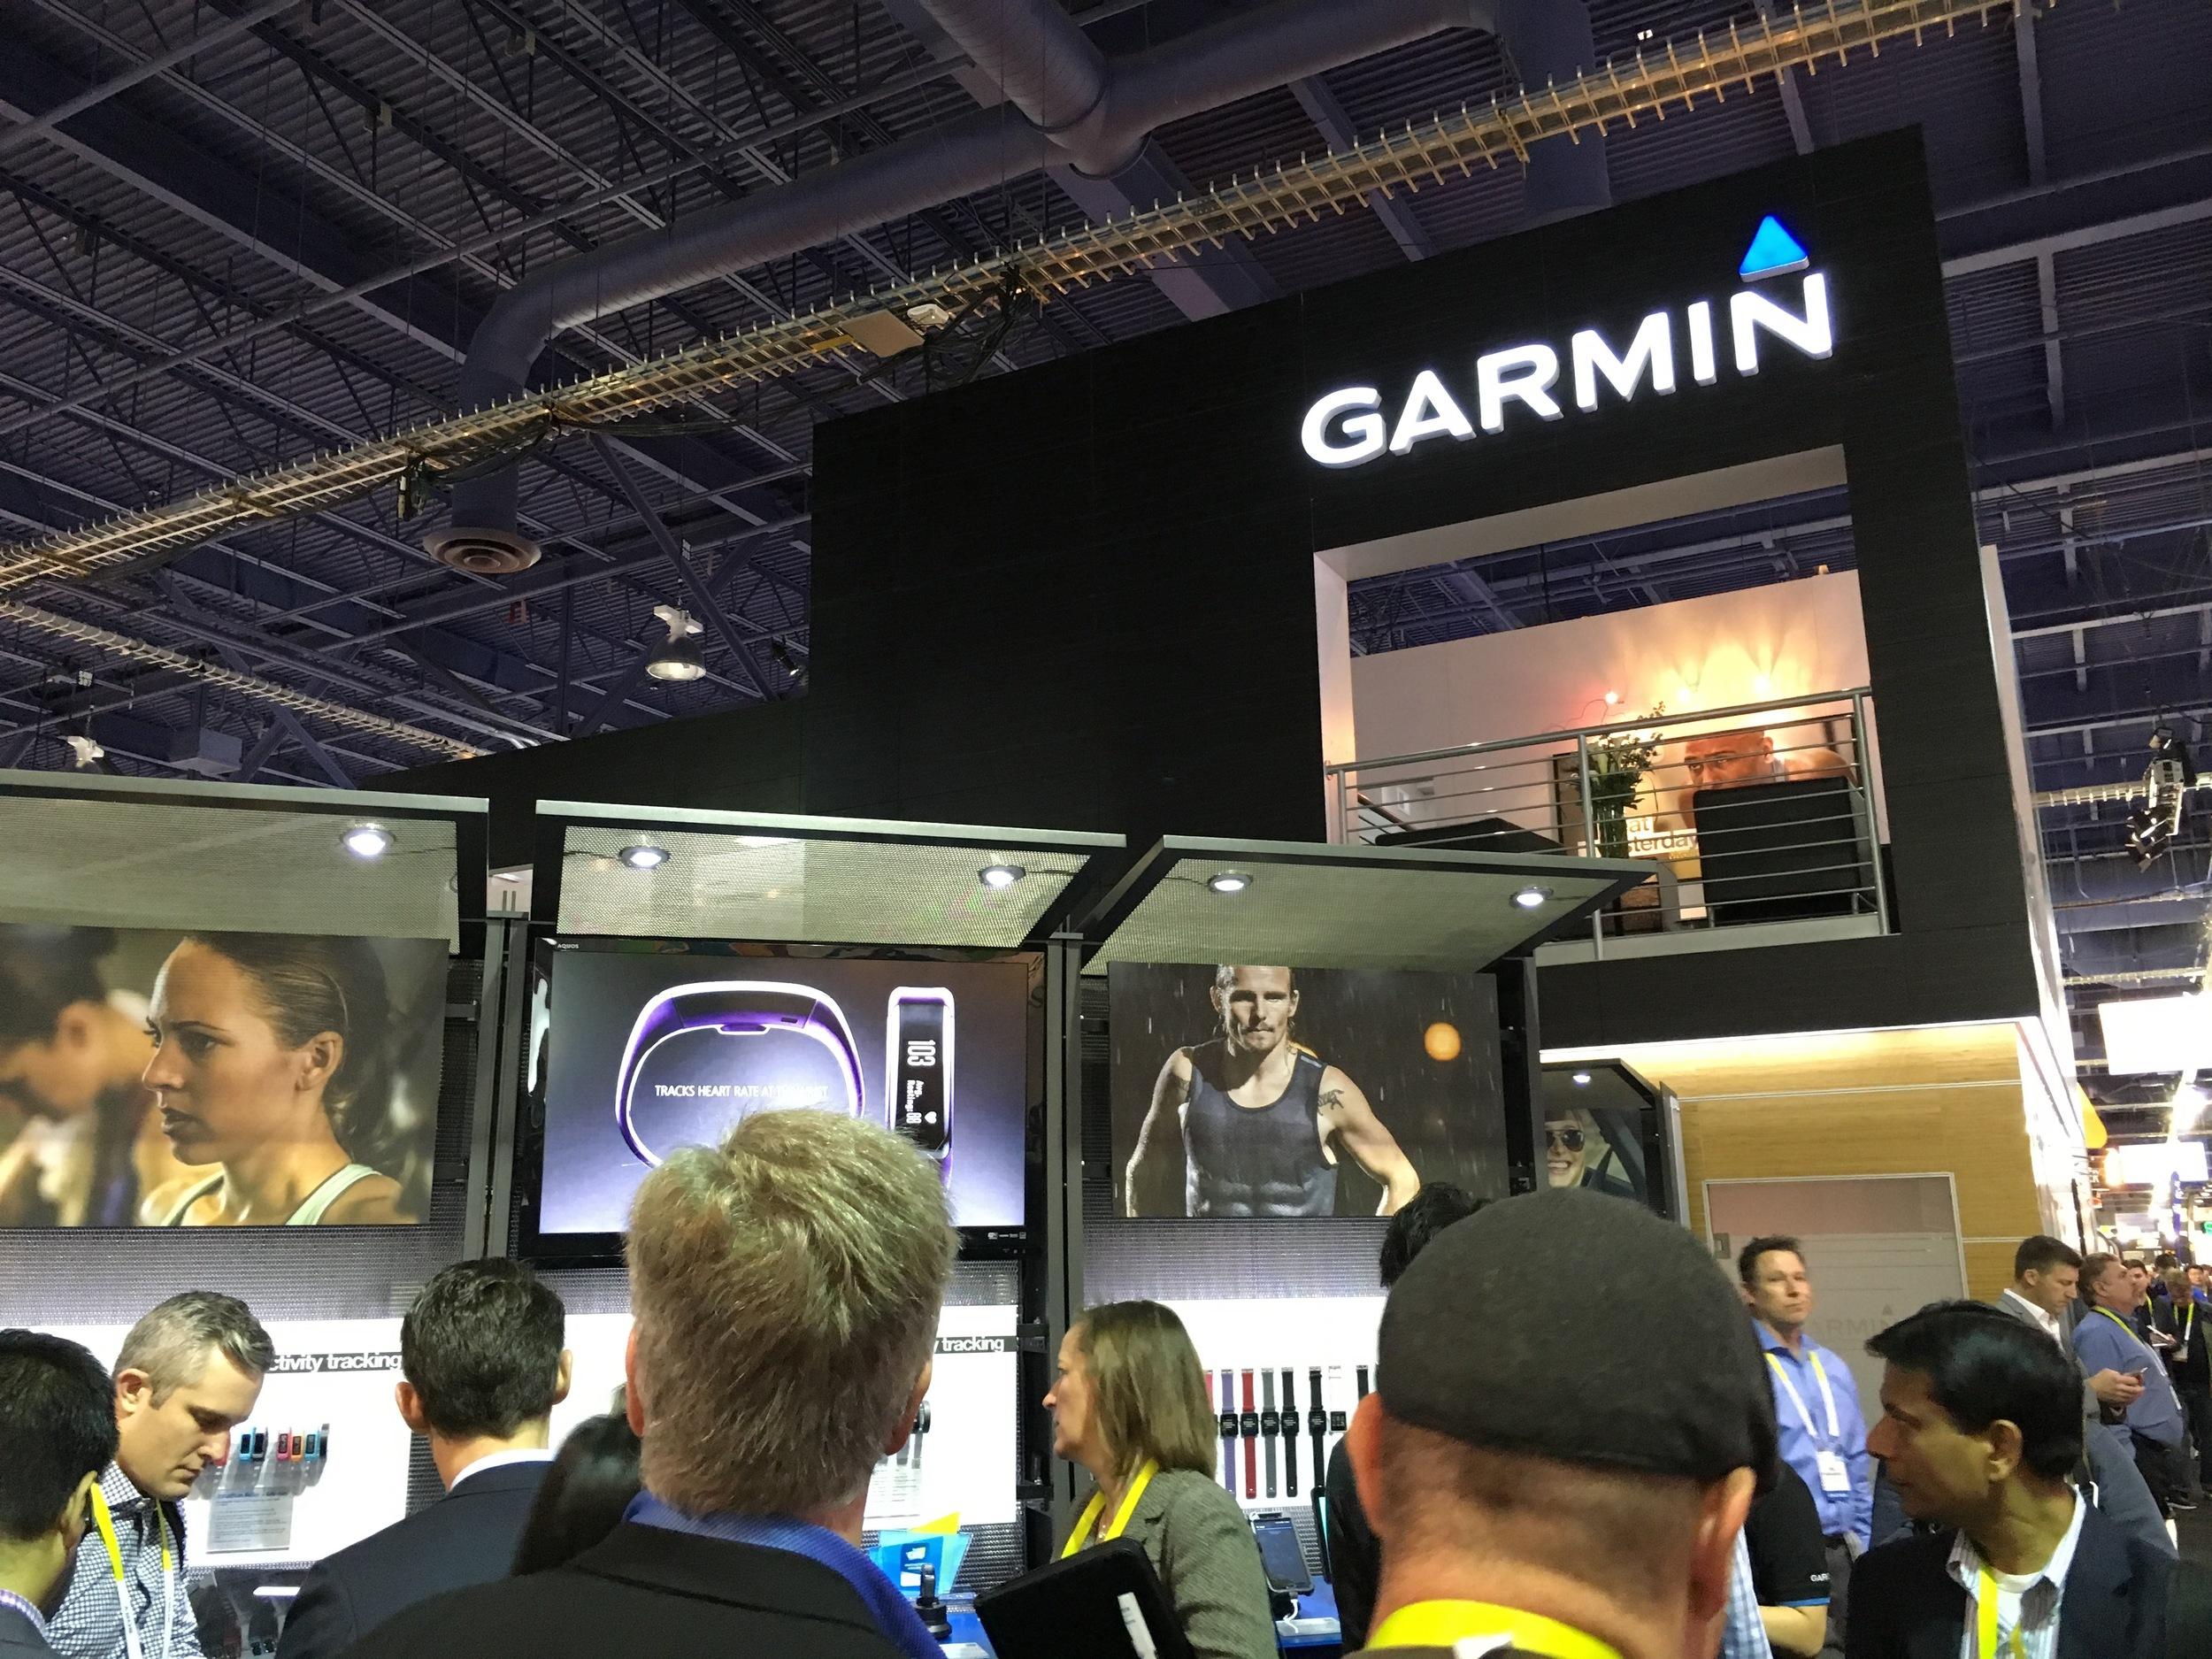 Garmin Showing off More than GPS